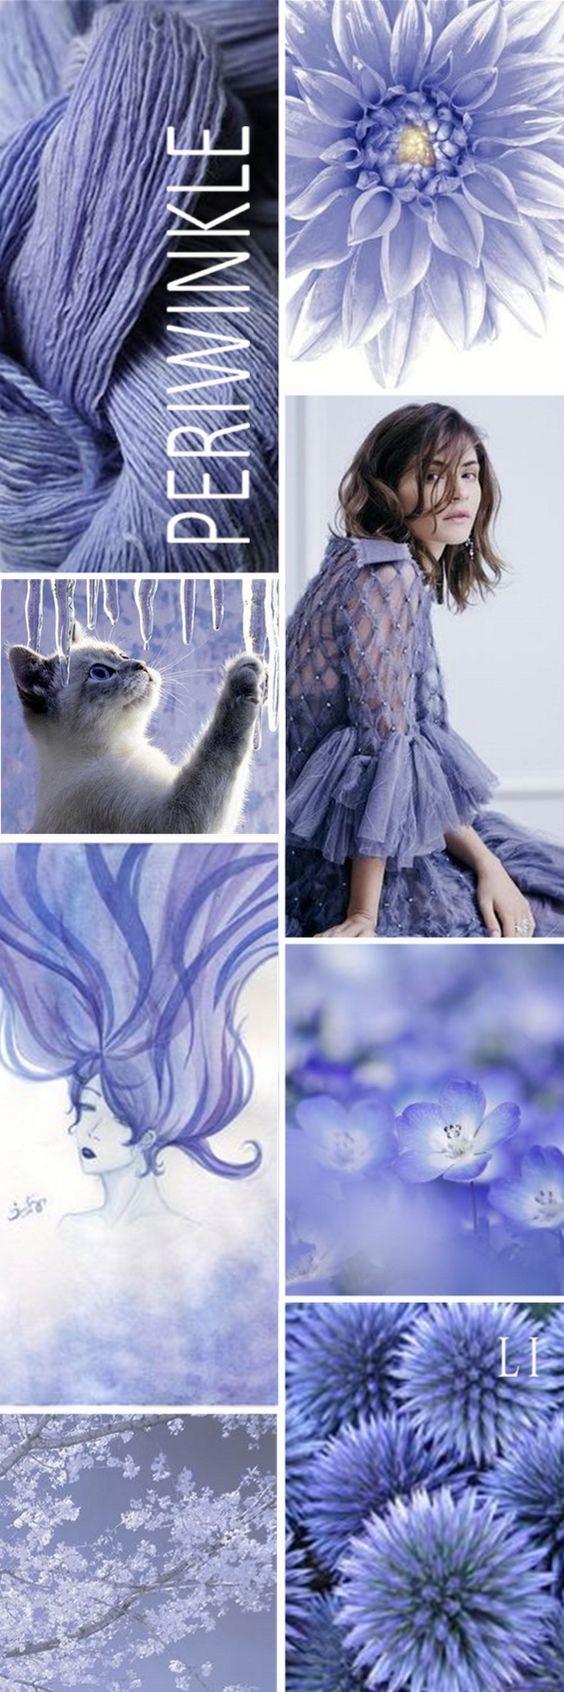 Сиренево-голубой